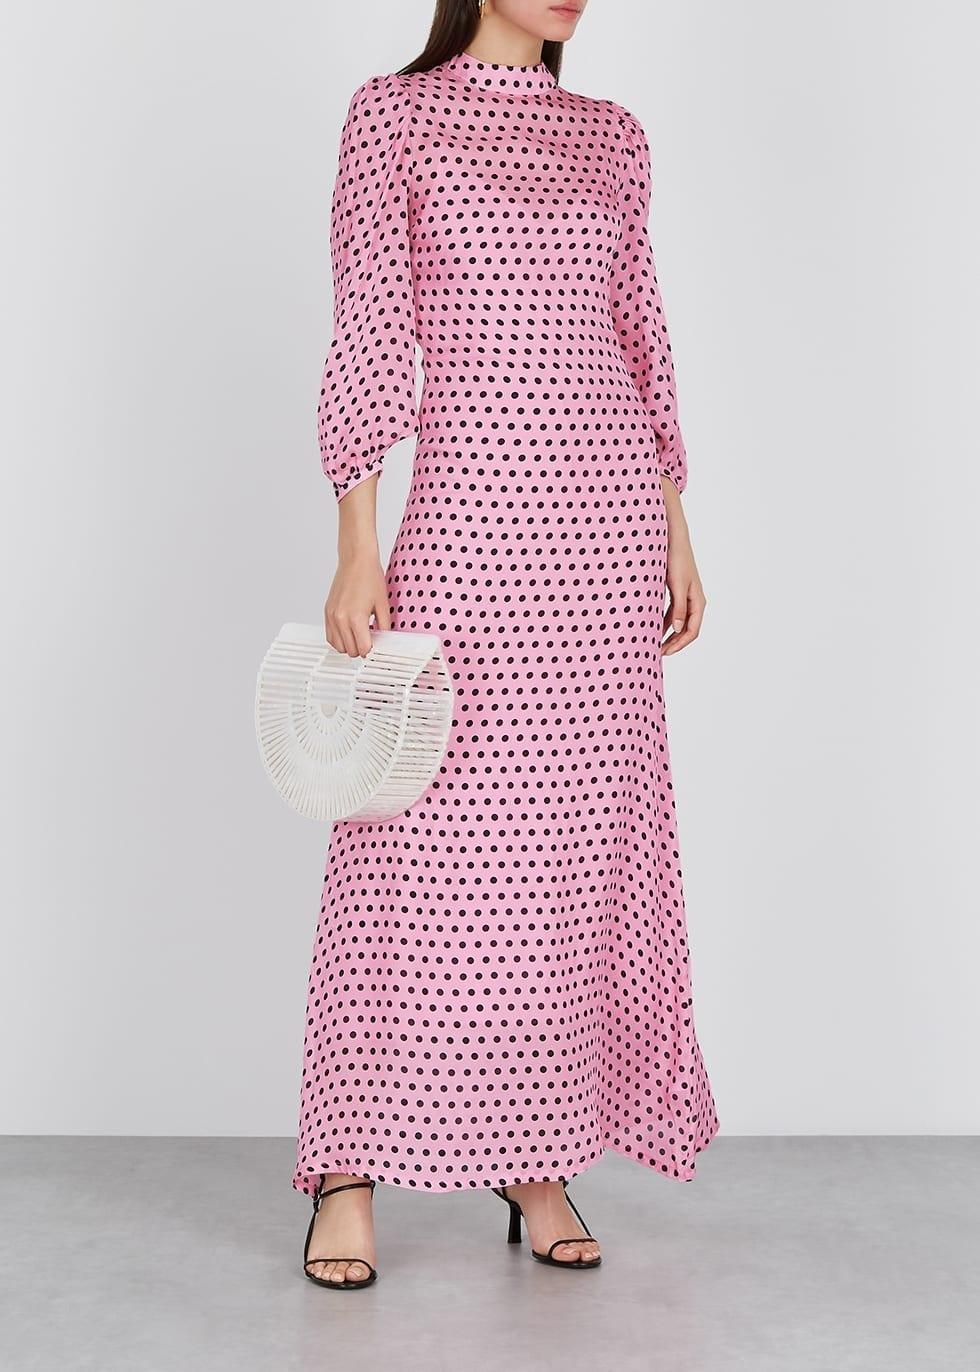 OLIVIA RUBIN Elizabeth Polka-dot Silk Maxi Dress